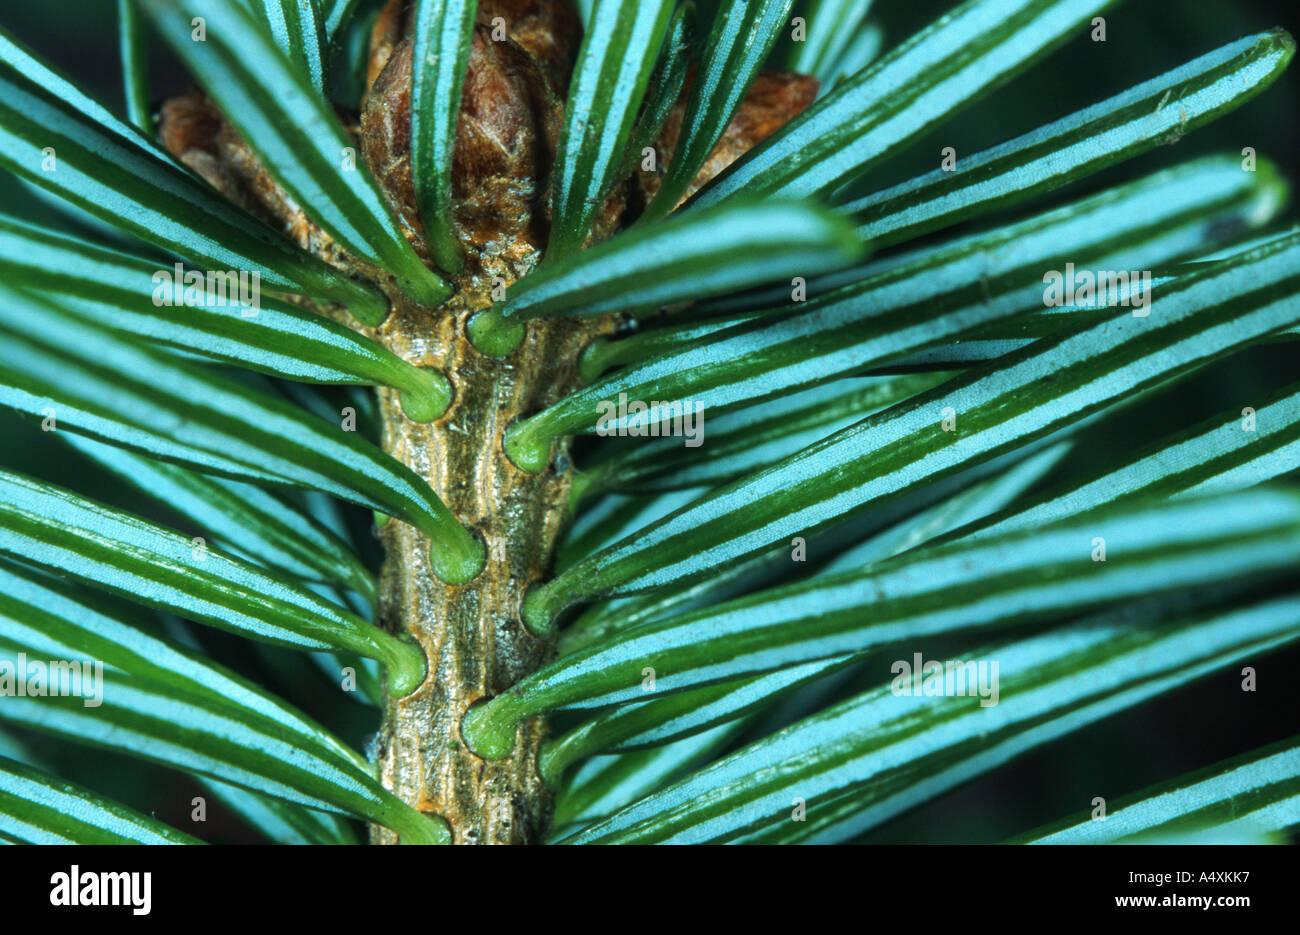 Nordman fir (Abies nordmanniana), underside of the leaves - Stock Image